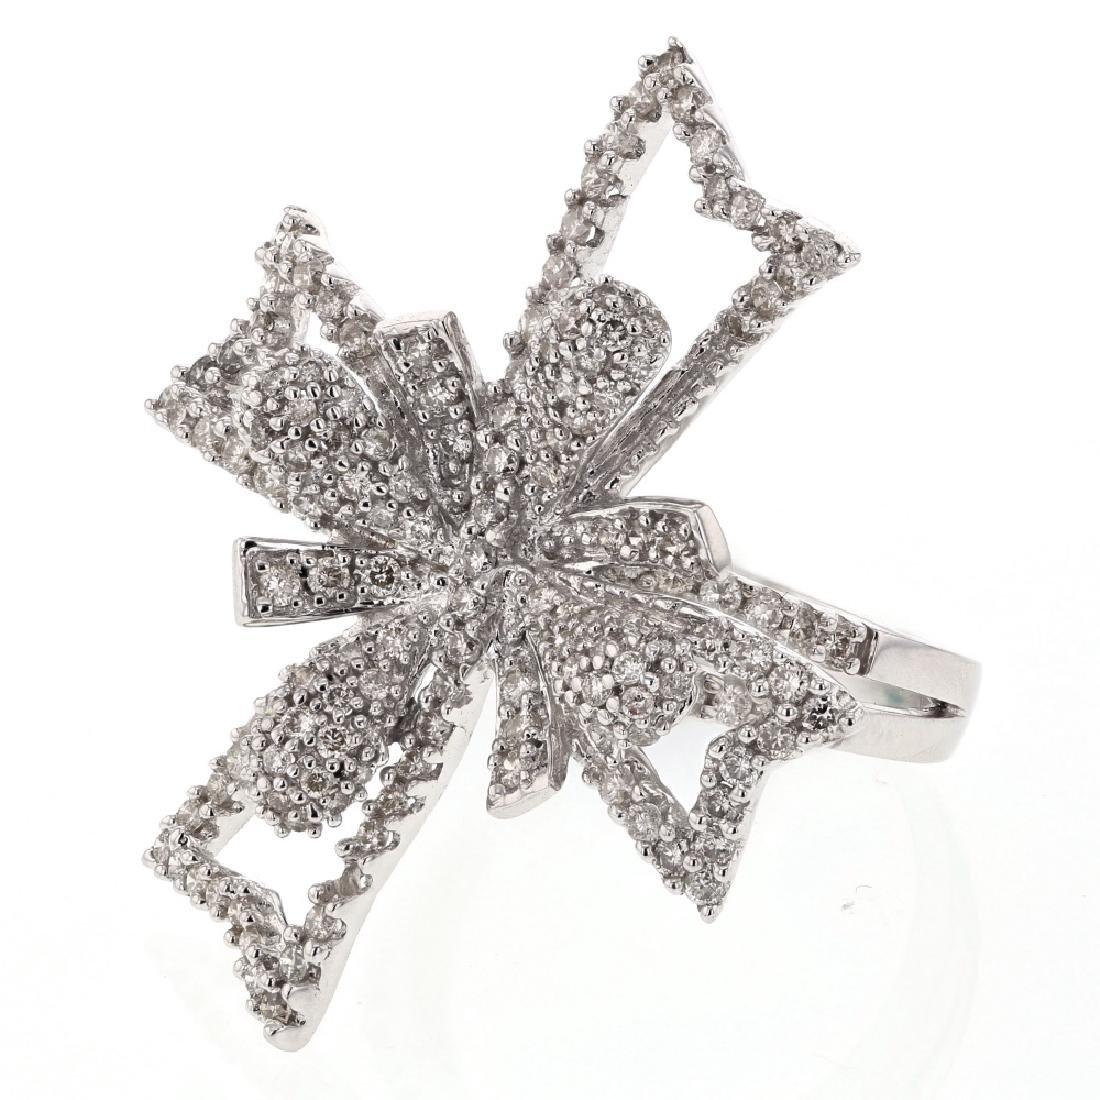 Flower Design Prong & Pave-set Diamond Ring in 14K